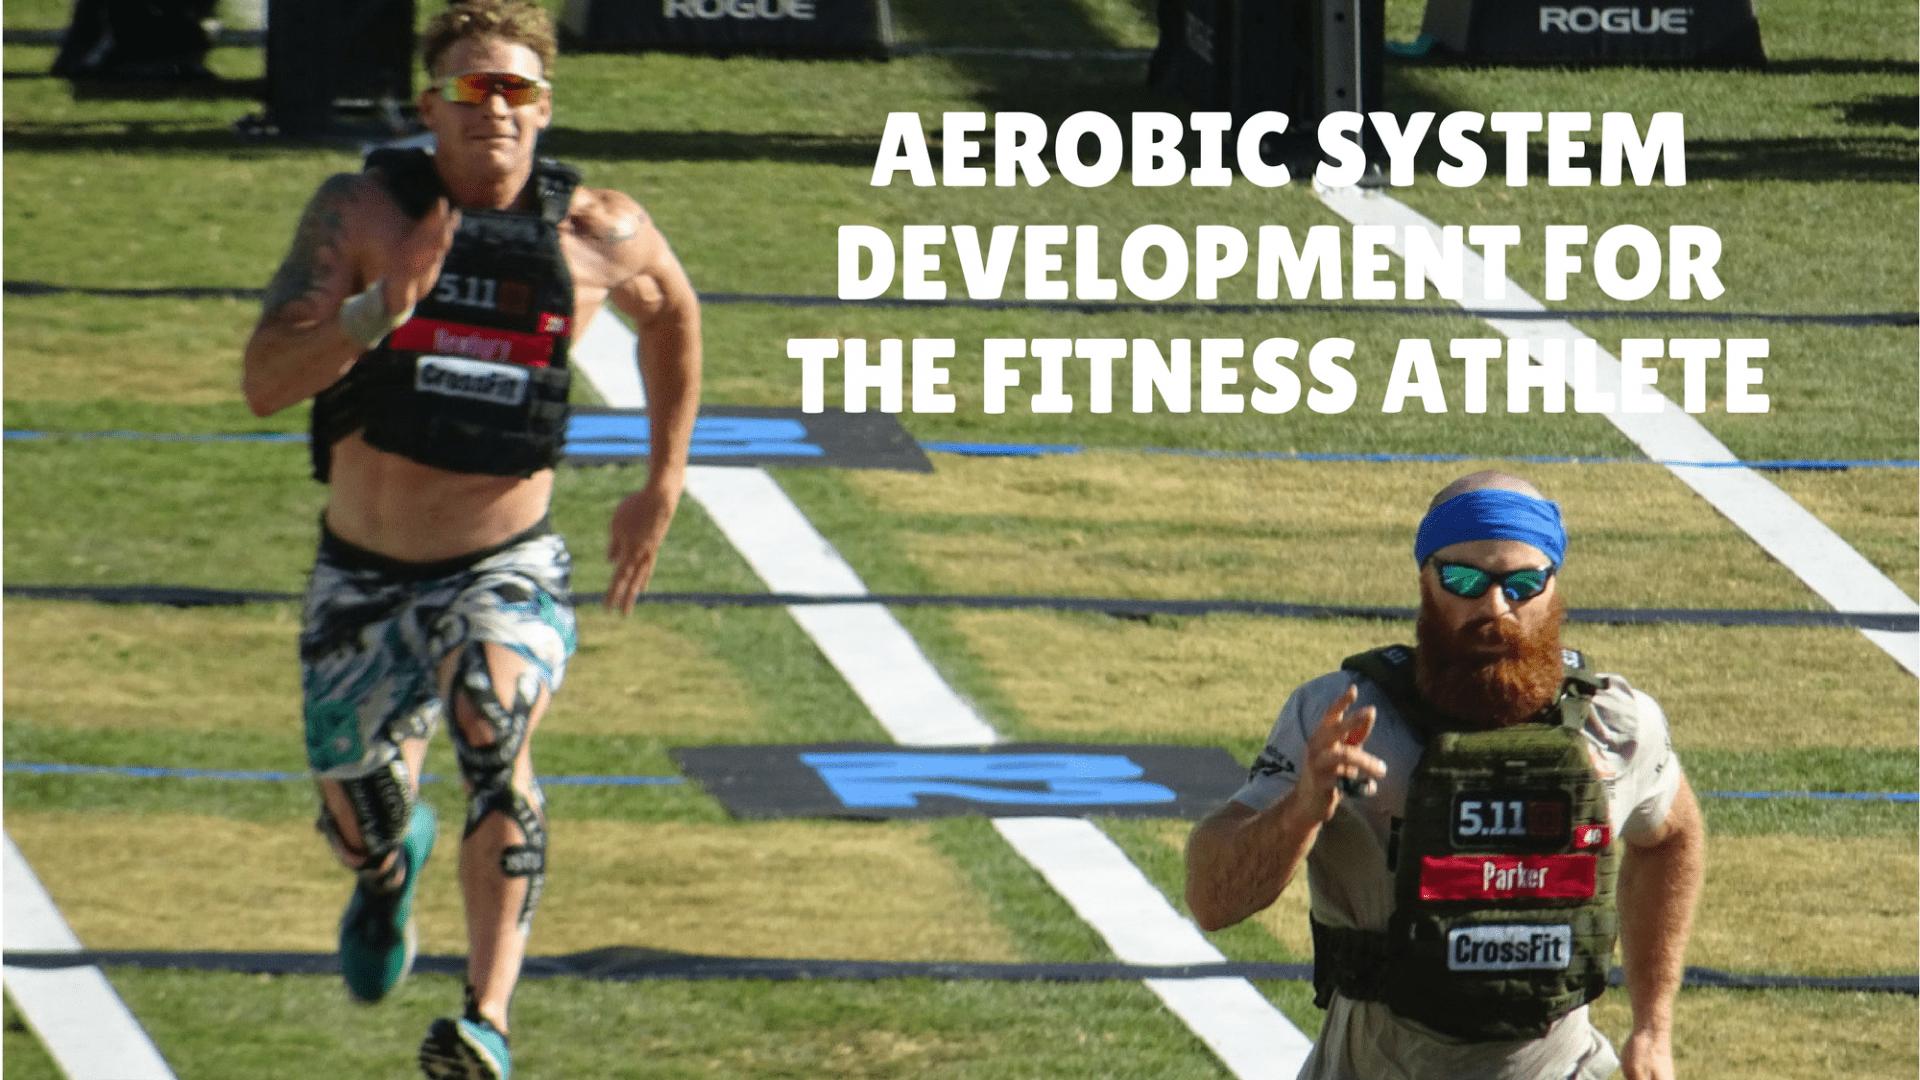 Aerobic system crossfit